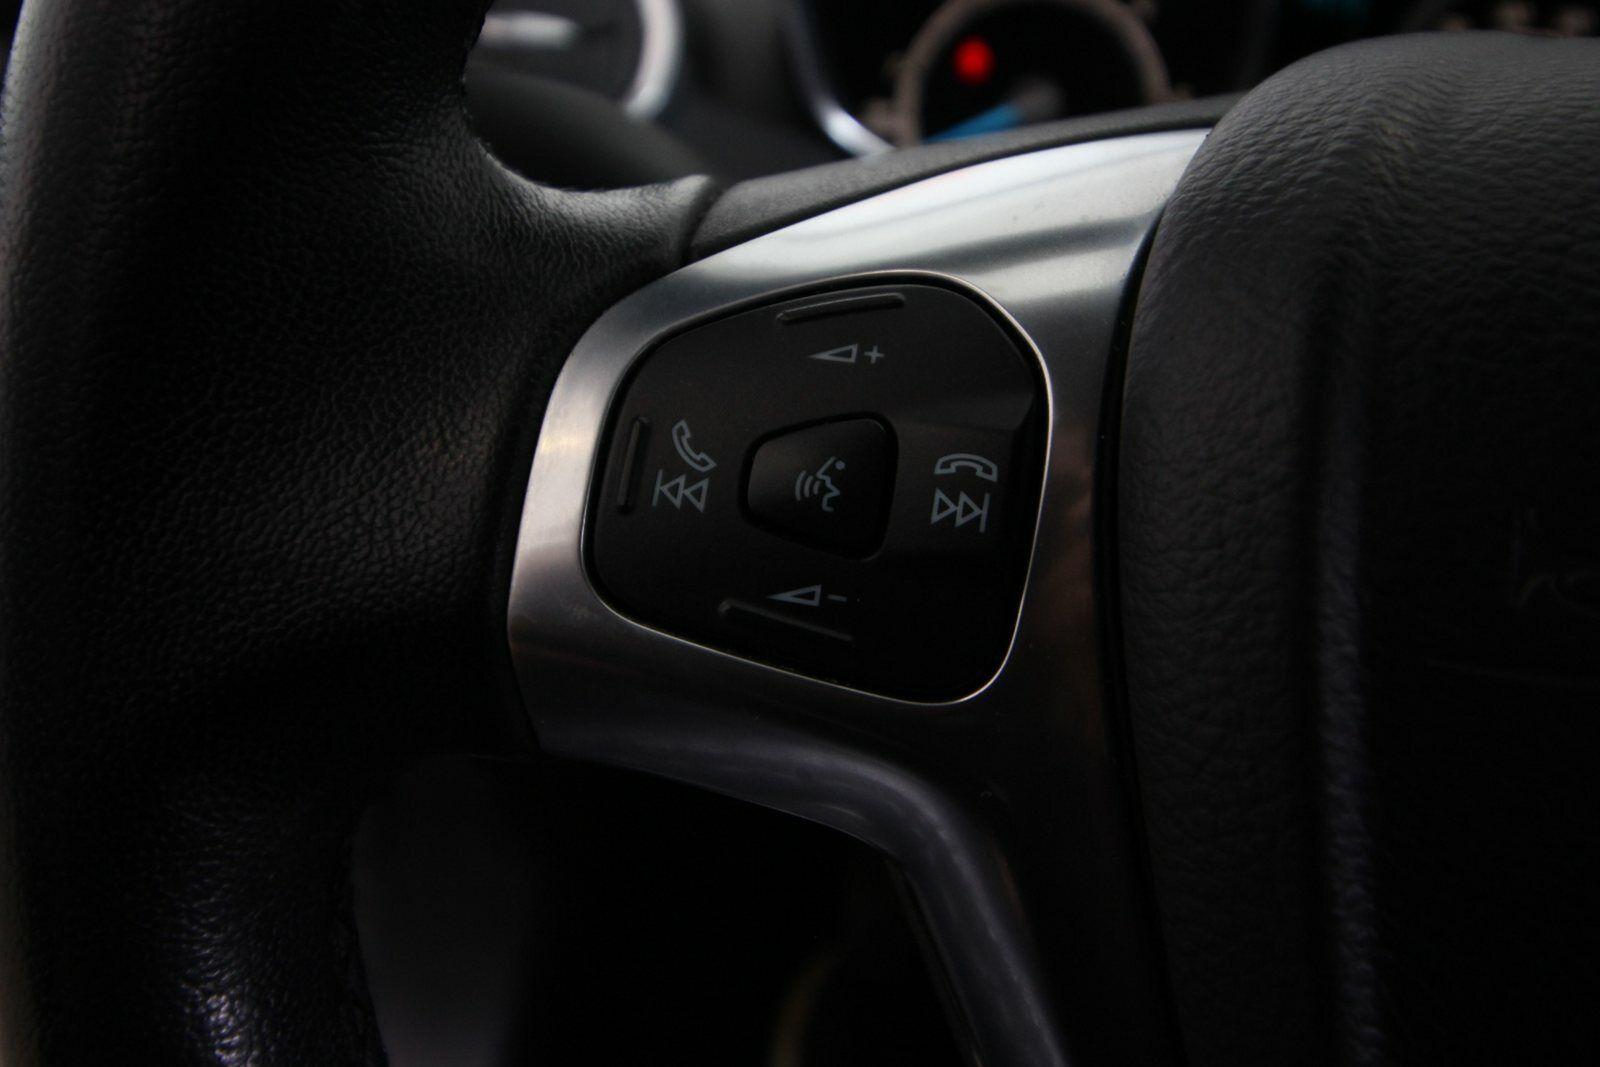 Ford Fiesta TDCi 95 Titanium Van